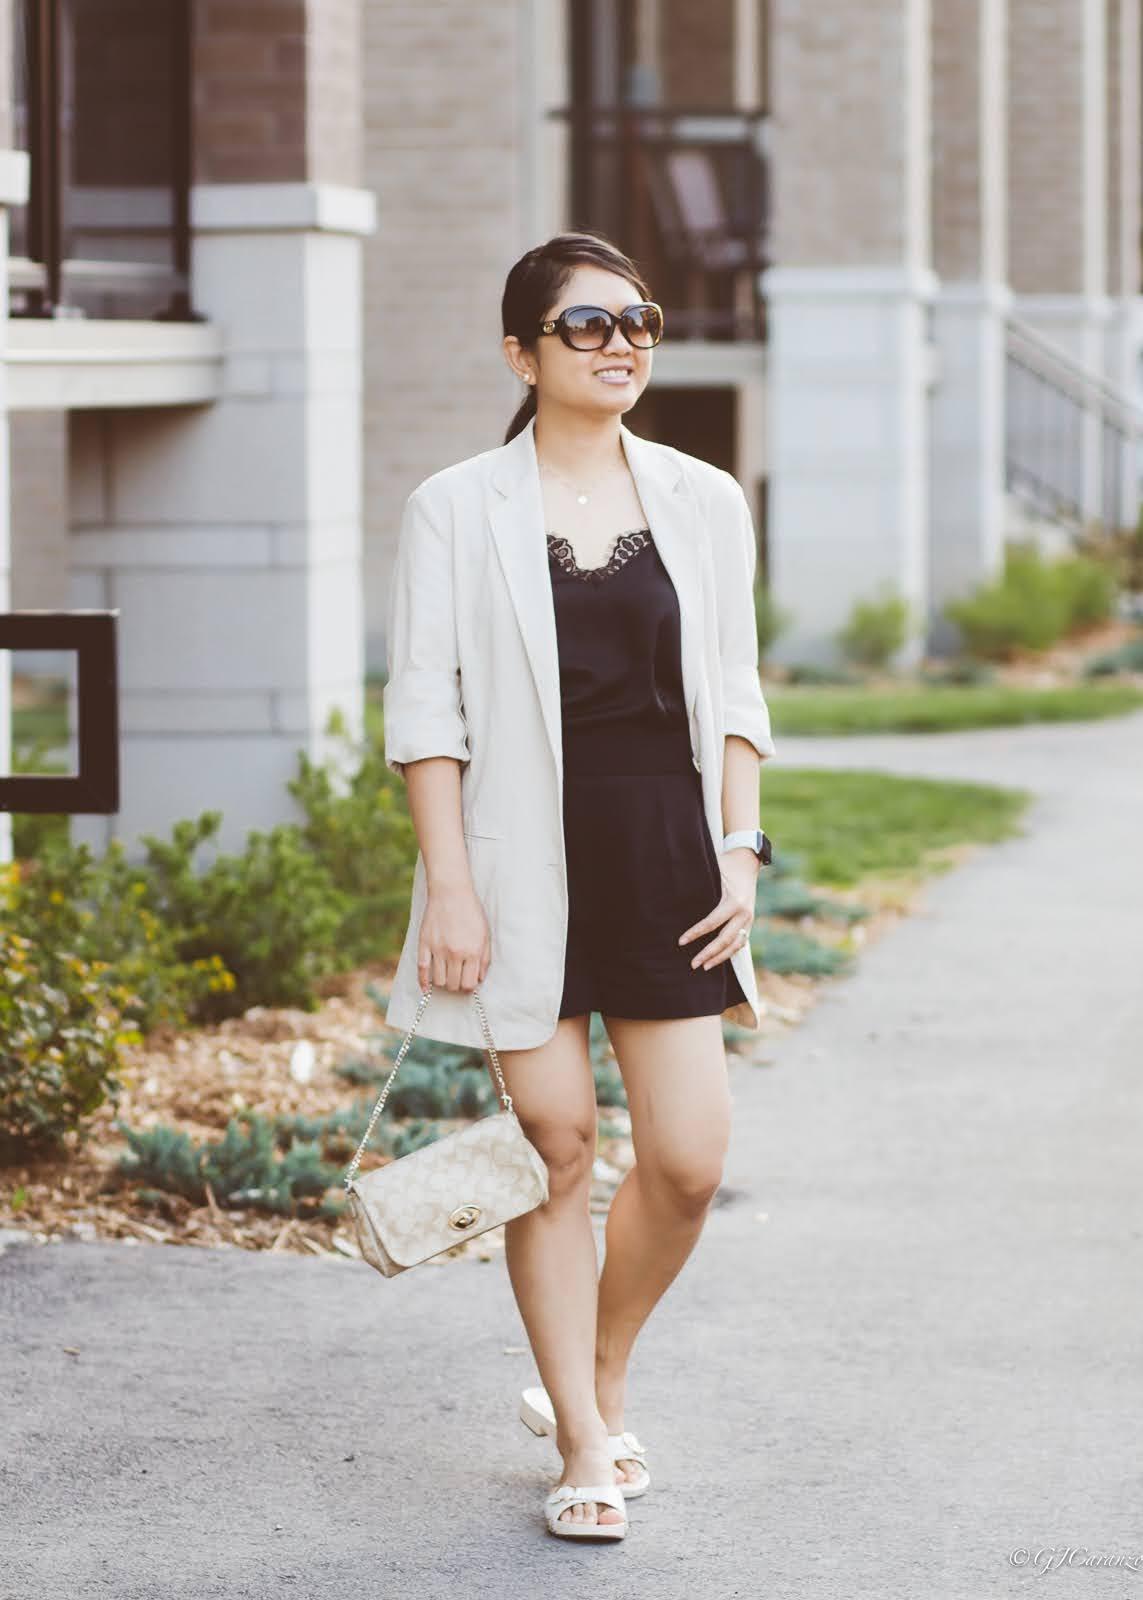 Uniqlo Linen blend Blazer | H&M Satin Camisole Top | Zara High Waisted Shorts | Coach Bleeker Sandals | Gucci Sunglasses | Coach Bag | Petite Fashion